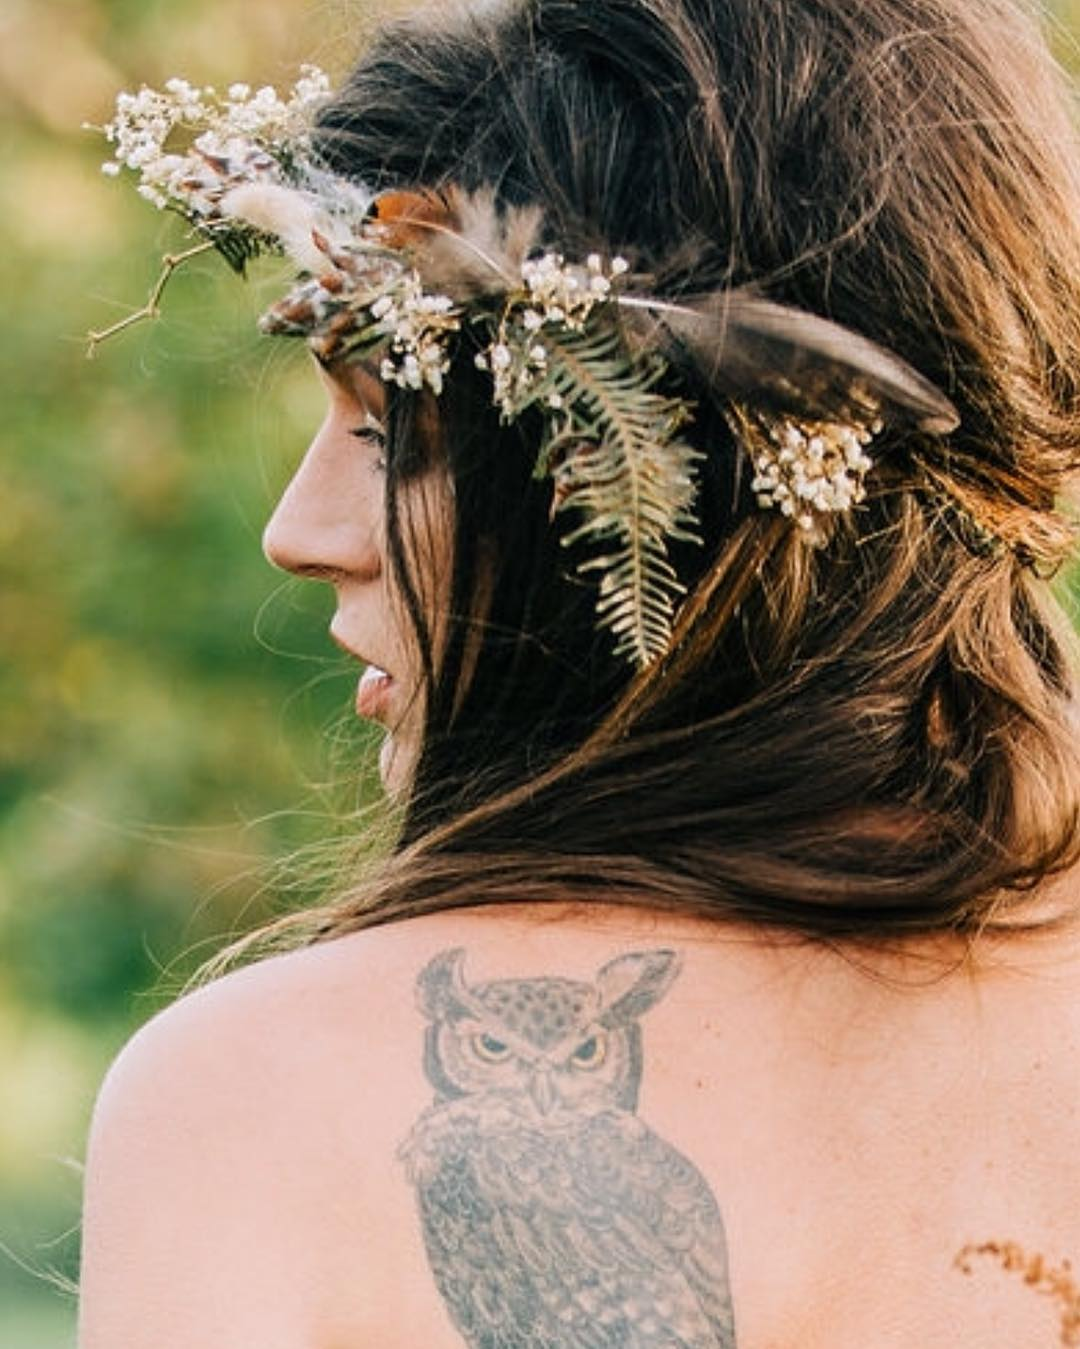 Happy birthday to this lovely lass- beautiful inside & out❤️ . photo | @erikafollansbee . . #boho #bohostyle #bohobride #gorgeous #weddinginspo #flowercrown #flowers #weddingdesign #styledshoot #getcreative #collaboration #lotusfloraldesigns #love